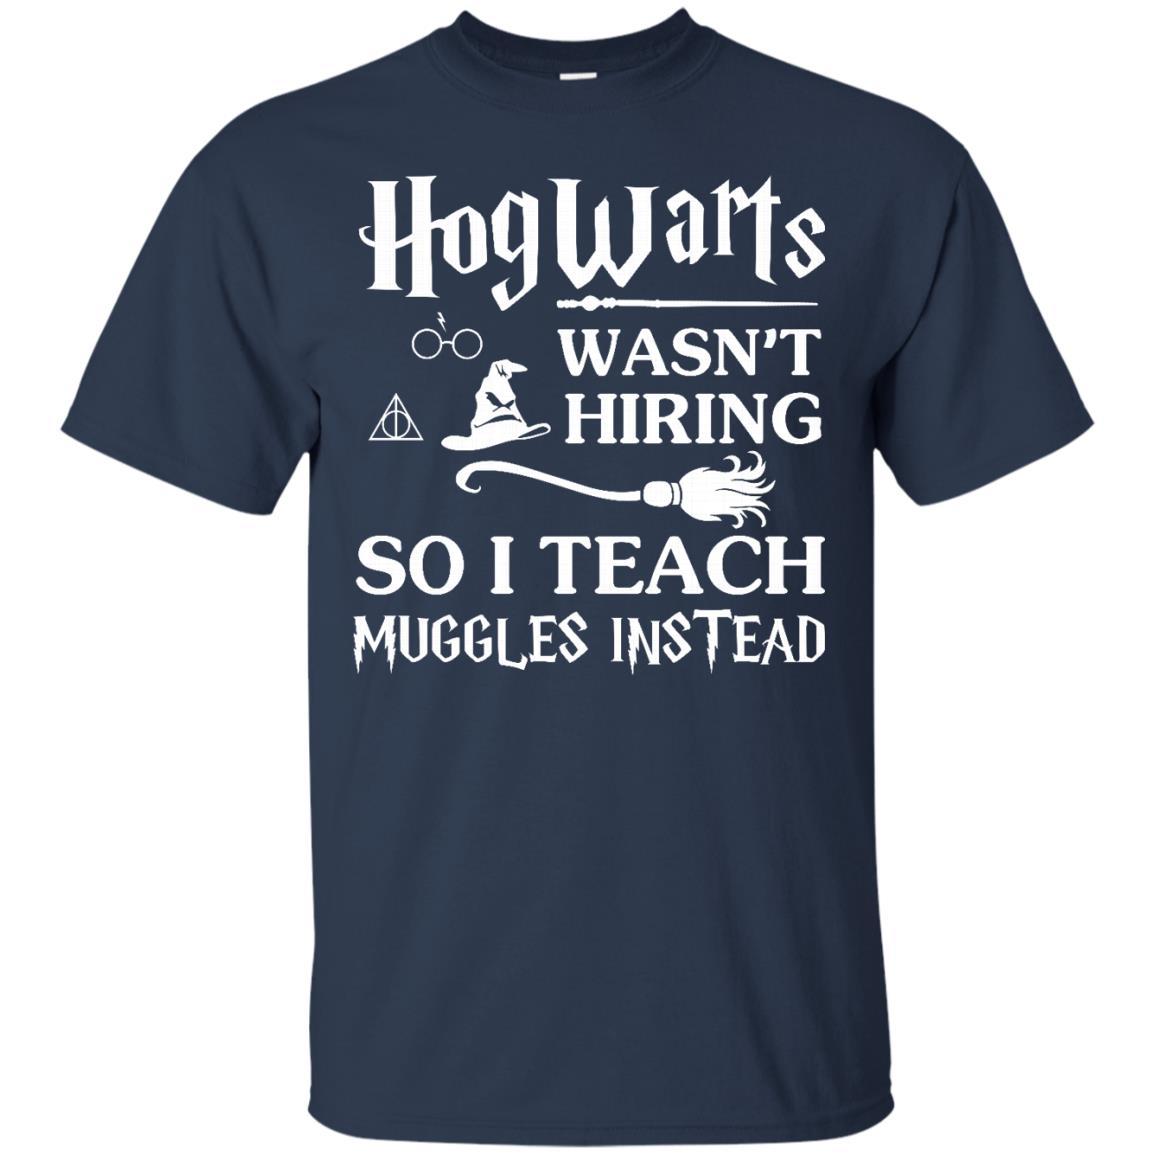 image 272px Hogwarts Wasn't Hiring So I Teach Muggles Instead T Shirts, Hoodies, Tank Top